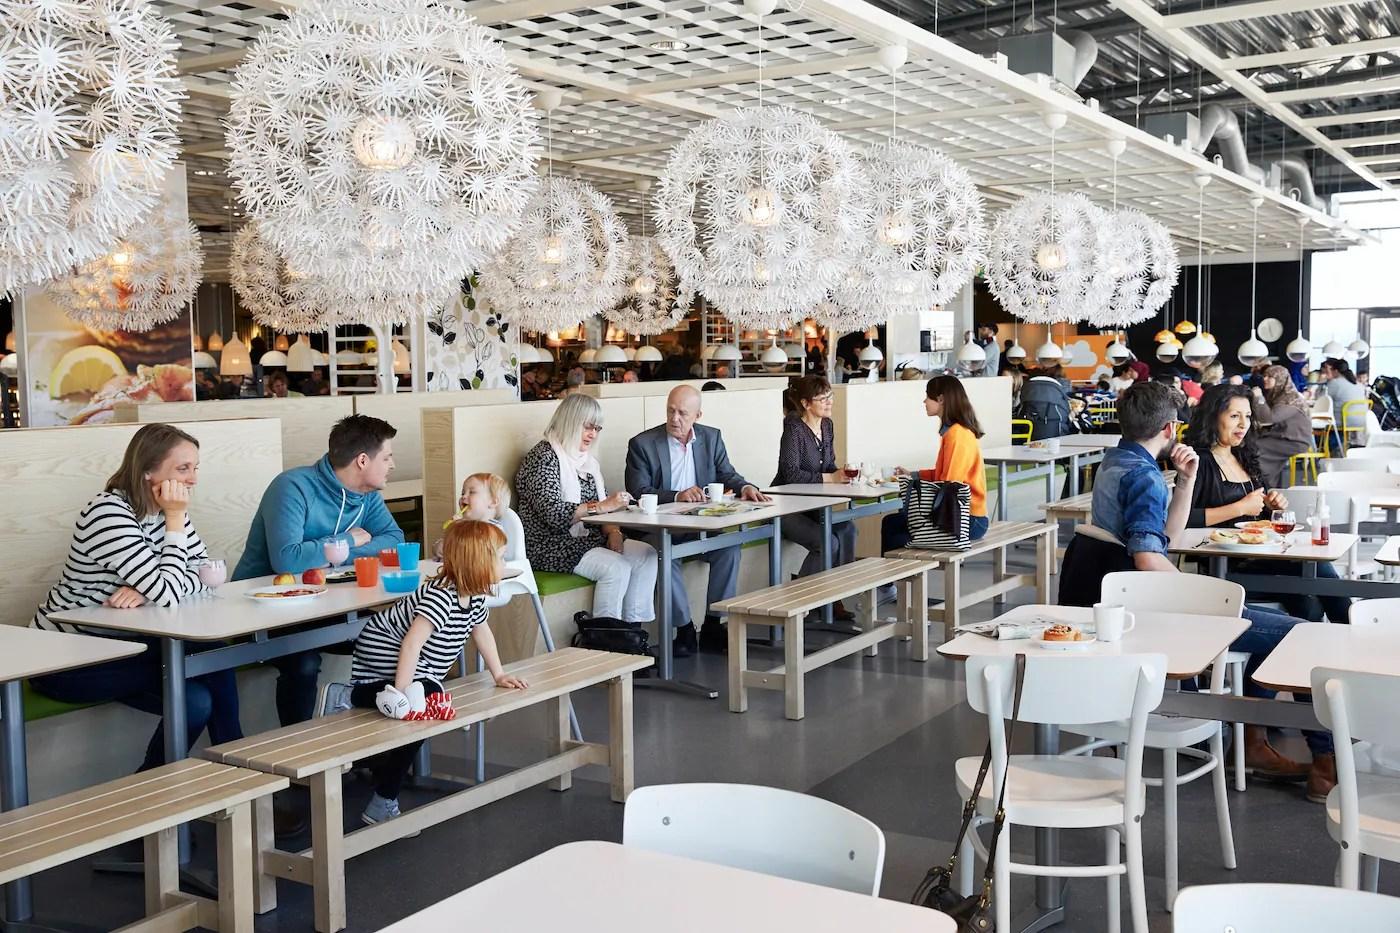 Essen bei IKEA Restaurant Rezepte  mehr  IKEA